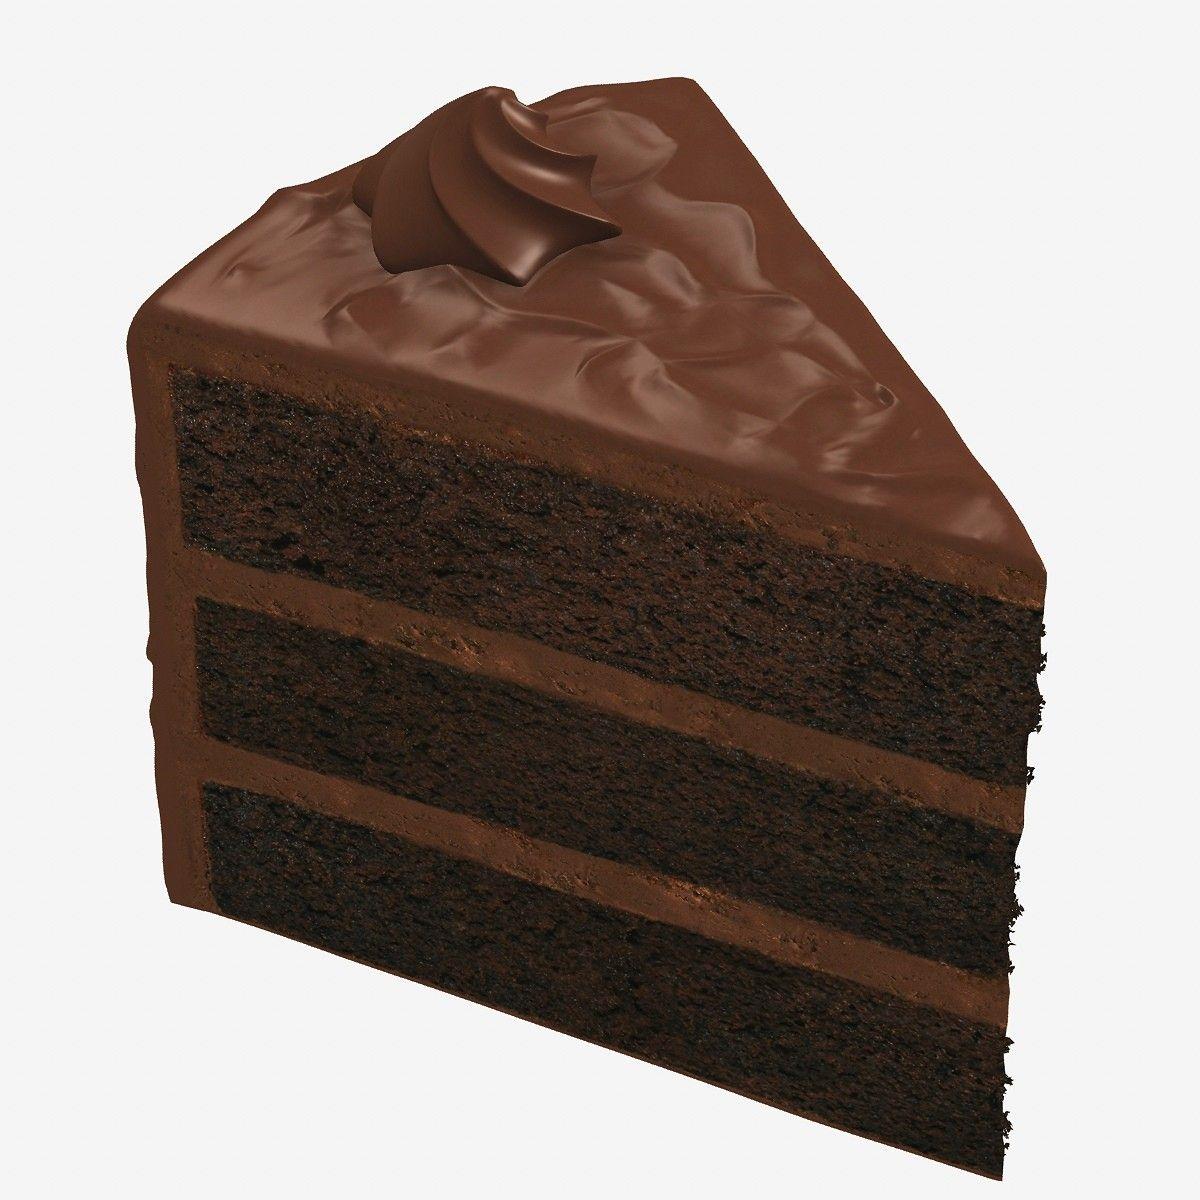 Chocolate Cake Slice Clip Art